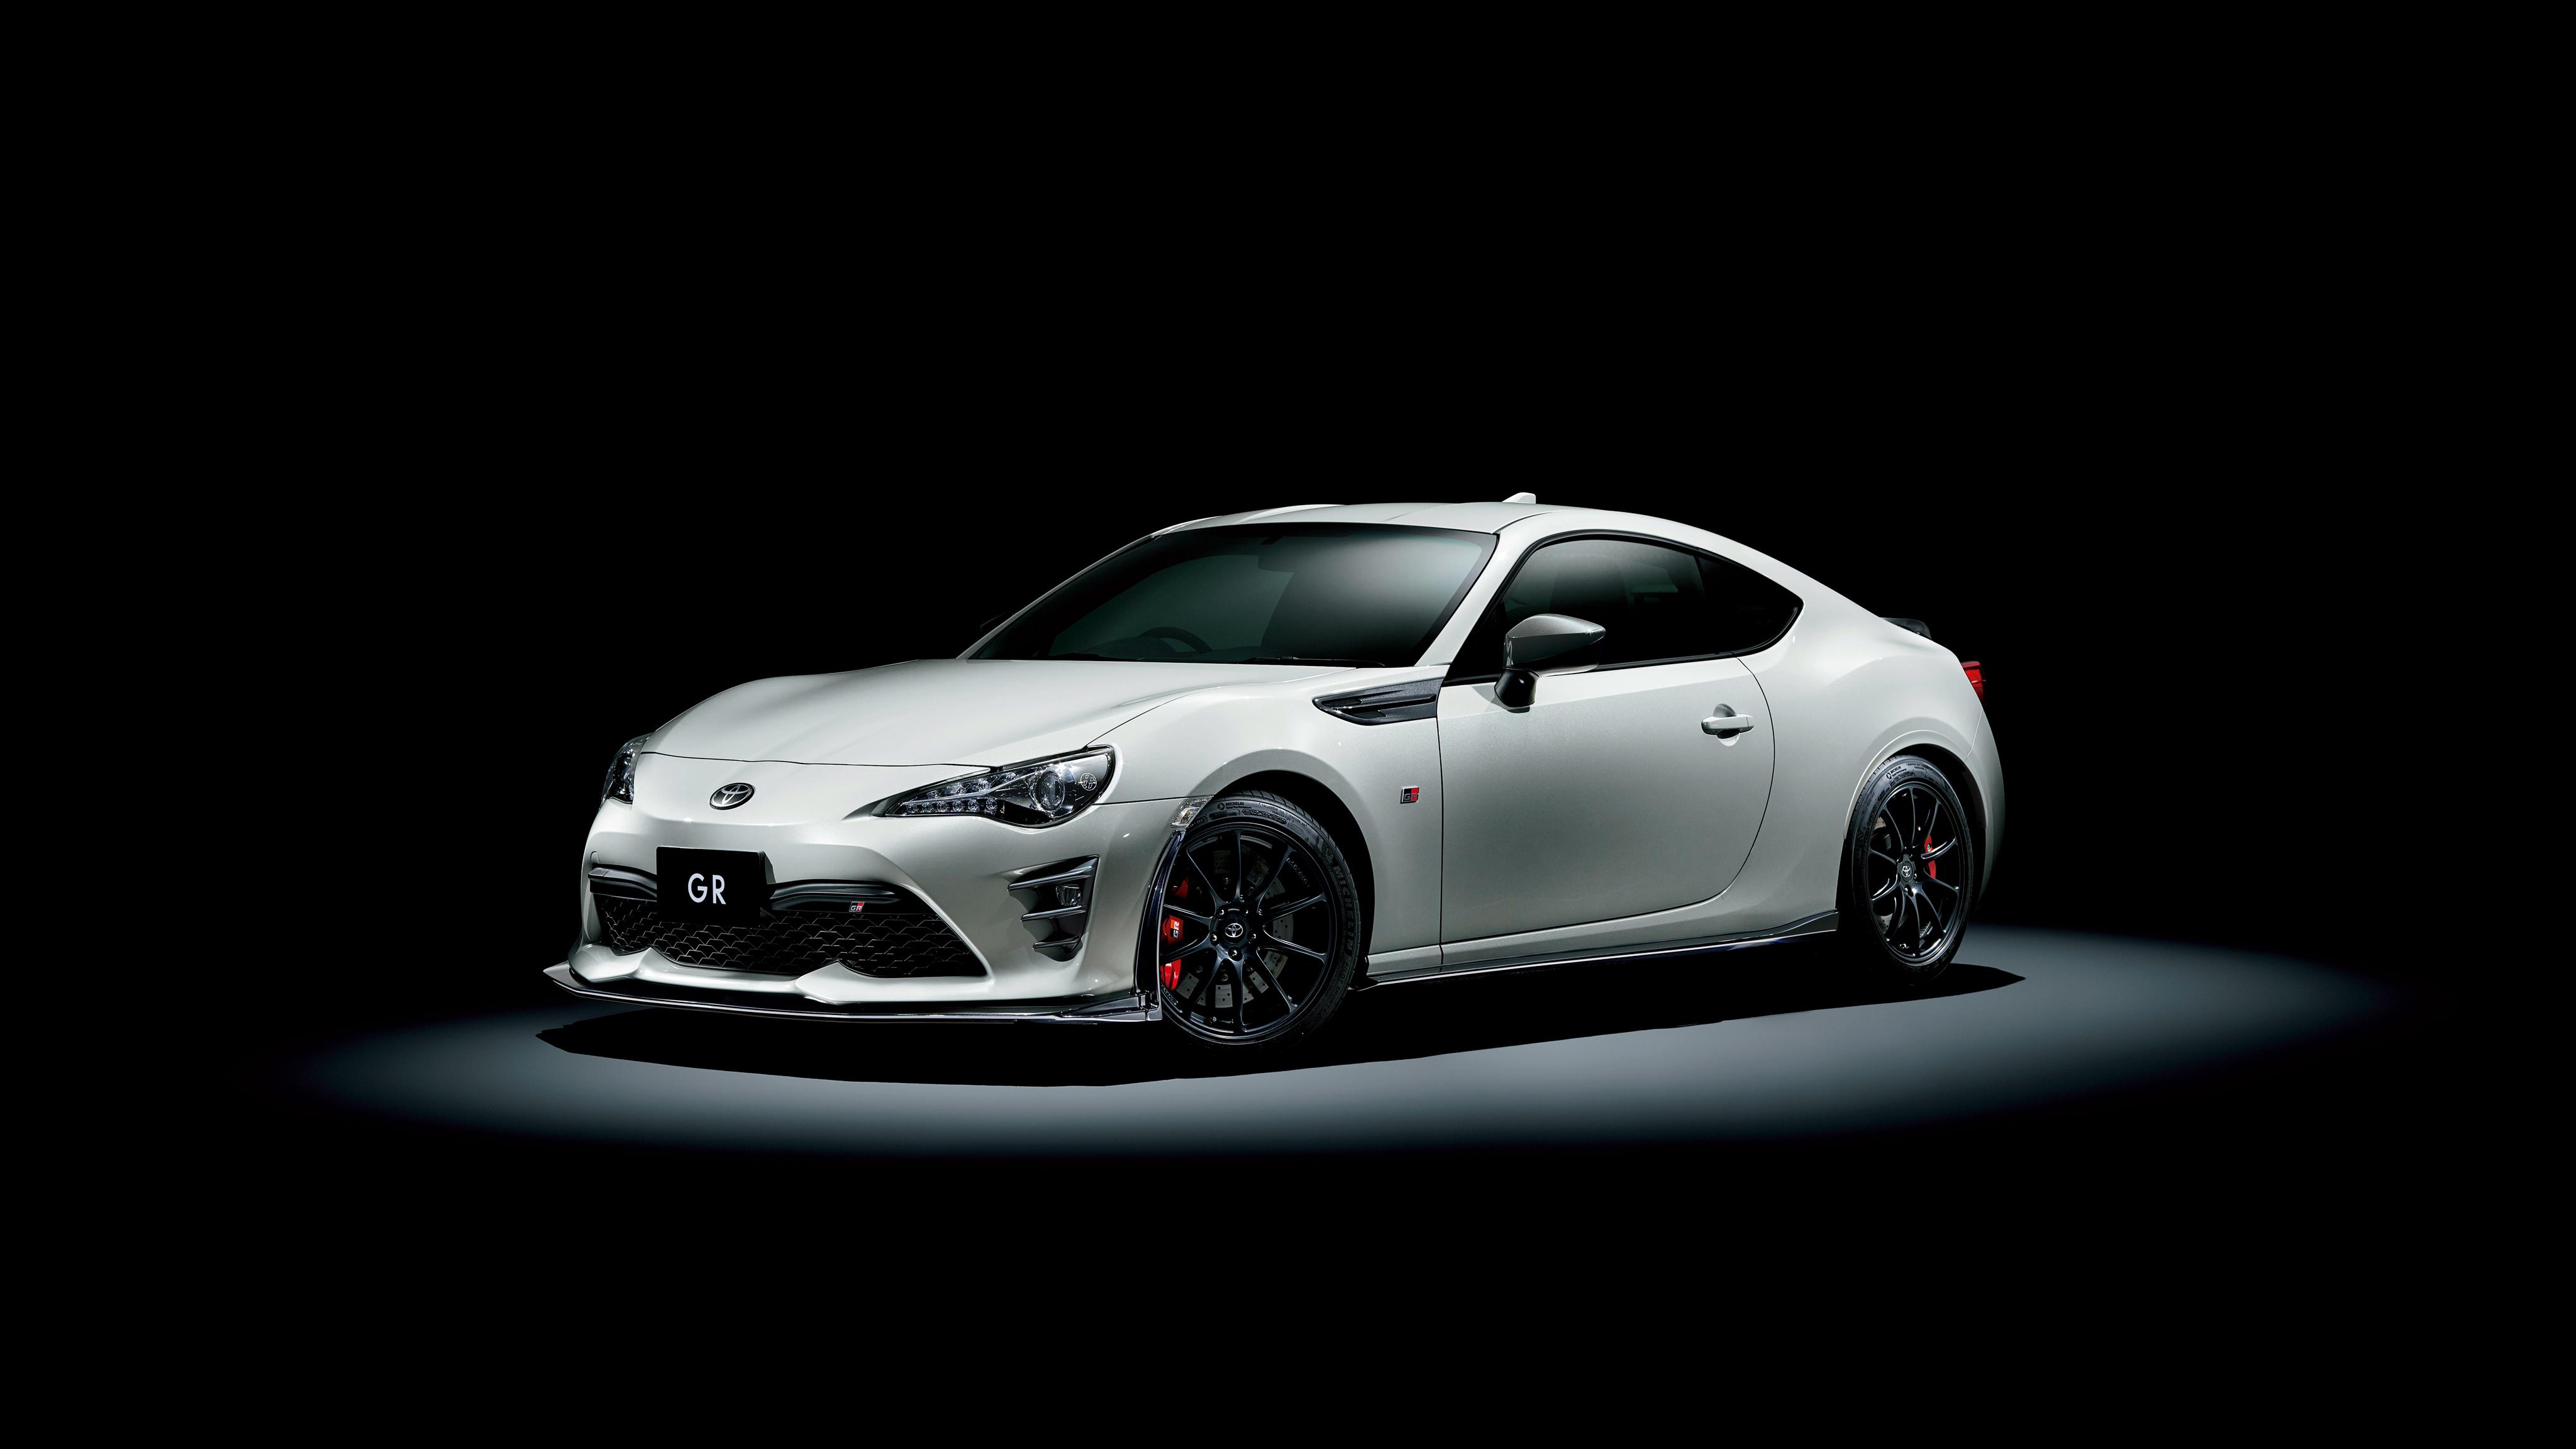 Toyota 86 GR Sports car 4K Wallpaper | HD Car Wallpapers ...